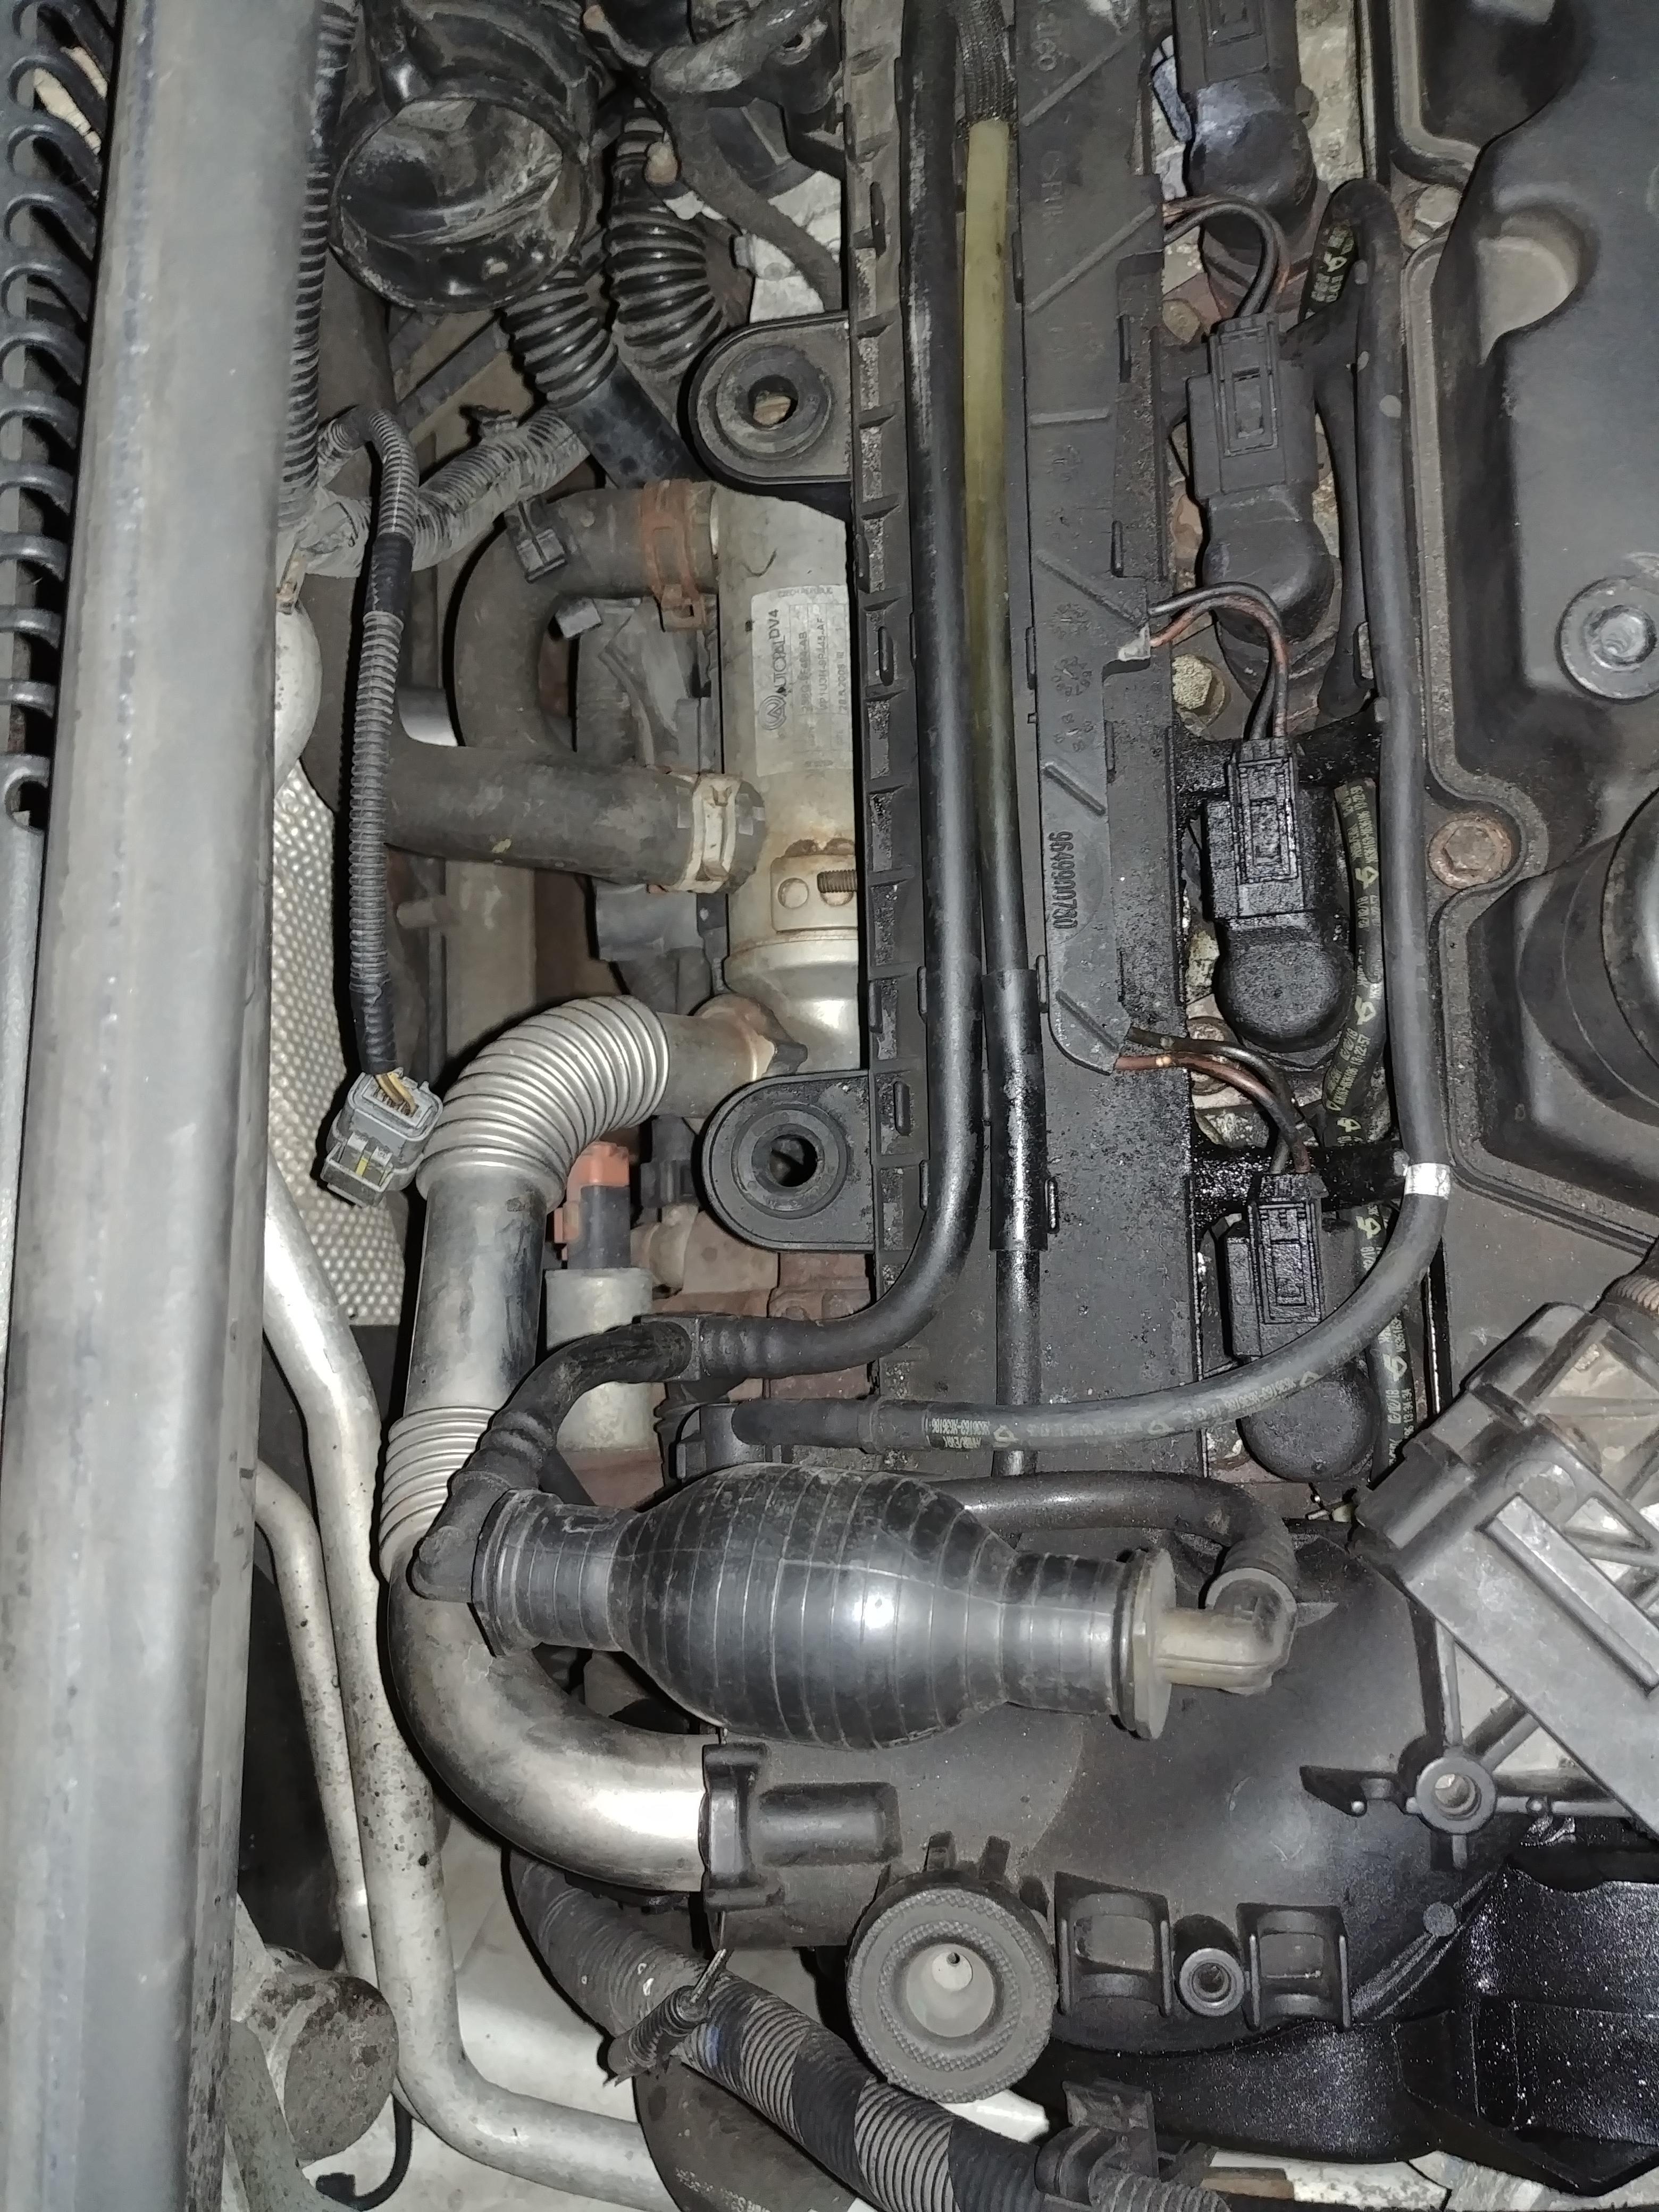 Fiesta 1 4 TDCi EGR and injectors question - Ford Fiesta